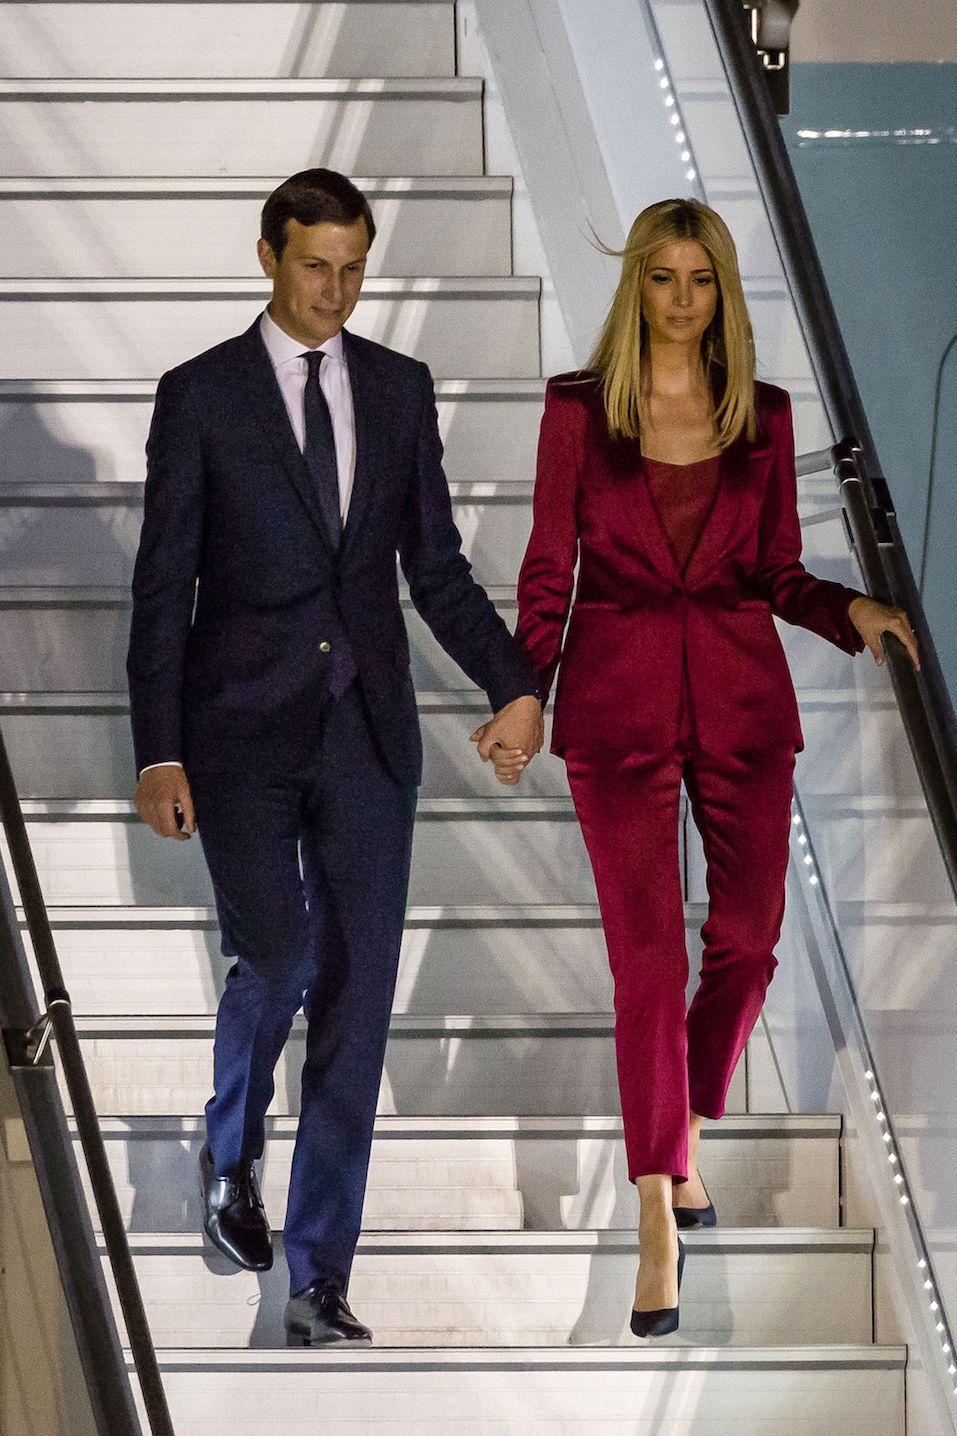 Ivanka Trump and Jared Kushner step off Air Force One